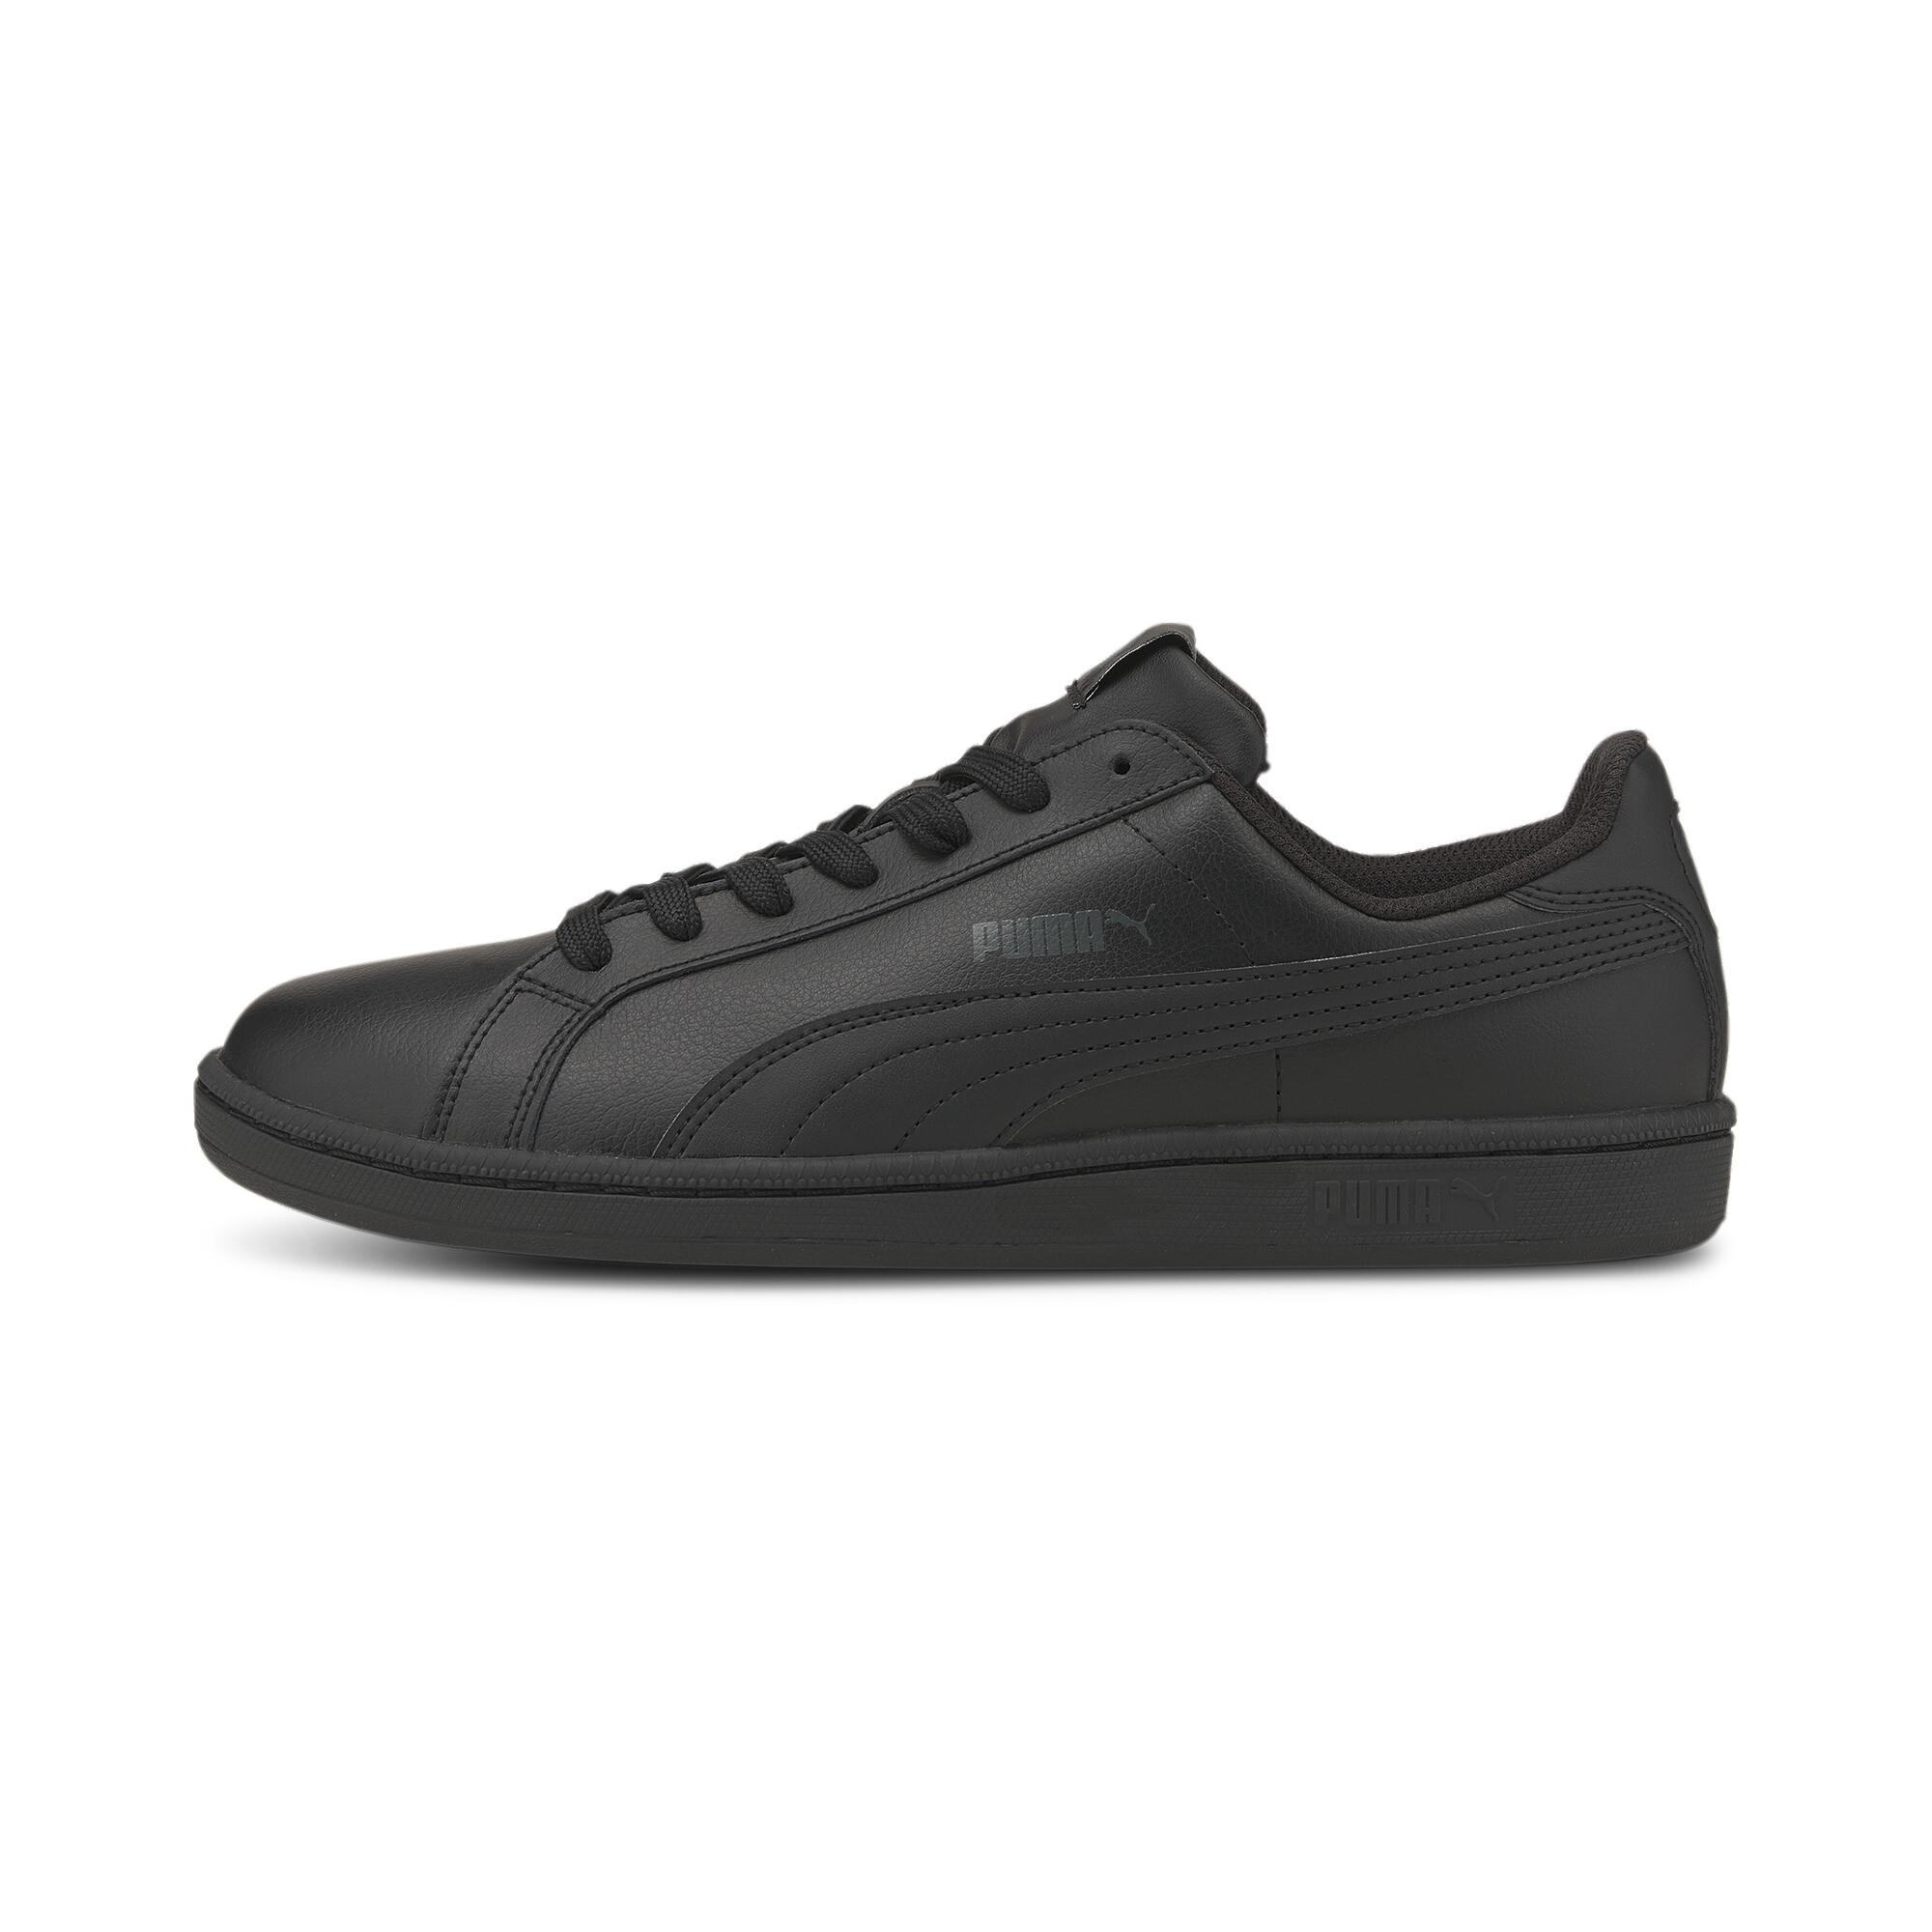 PUMA-Smash-Trainers-Schuhe-Sneakers-Sport-Classics-Unisex-Neu Indexbild 4